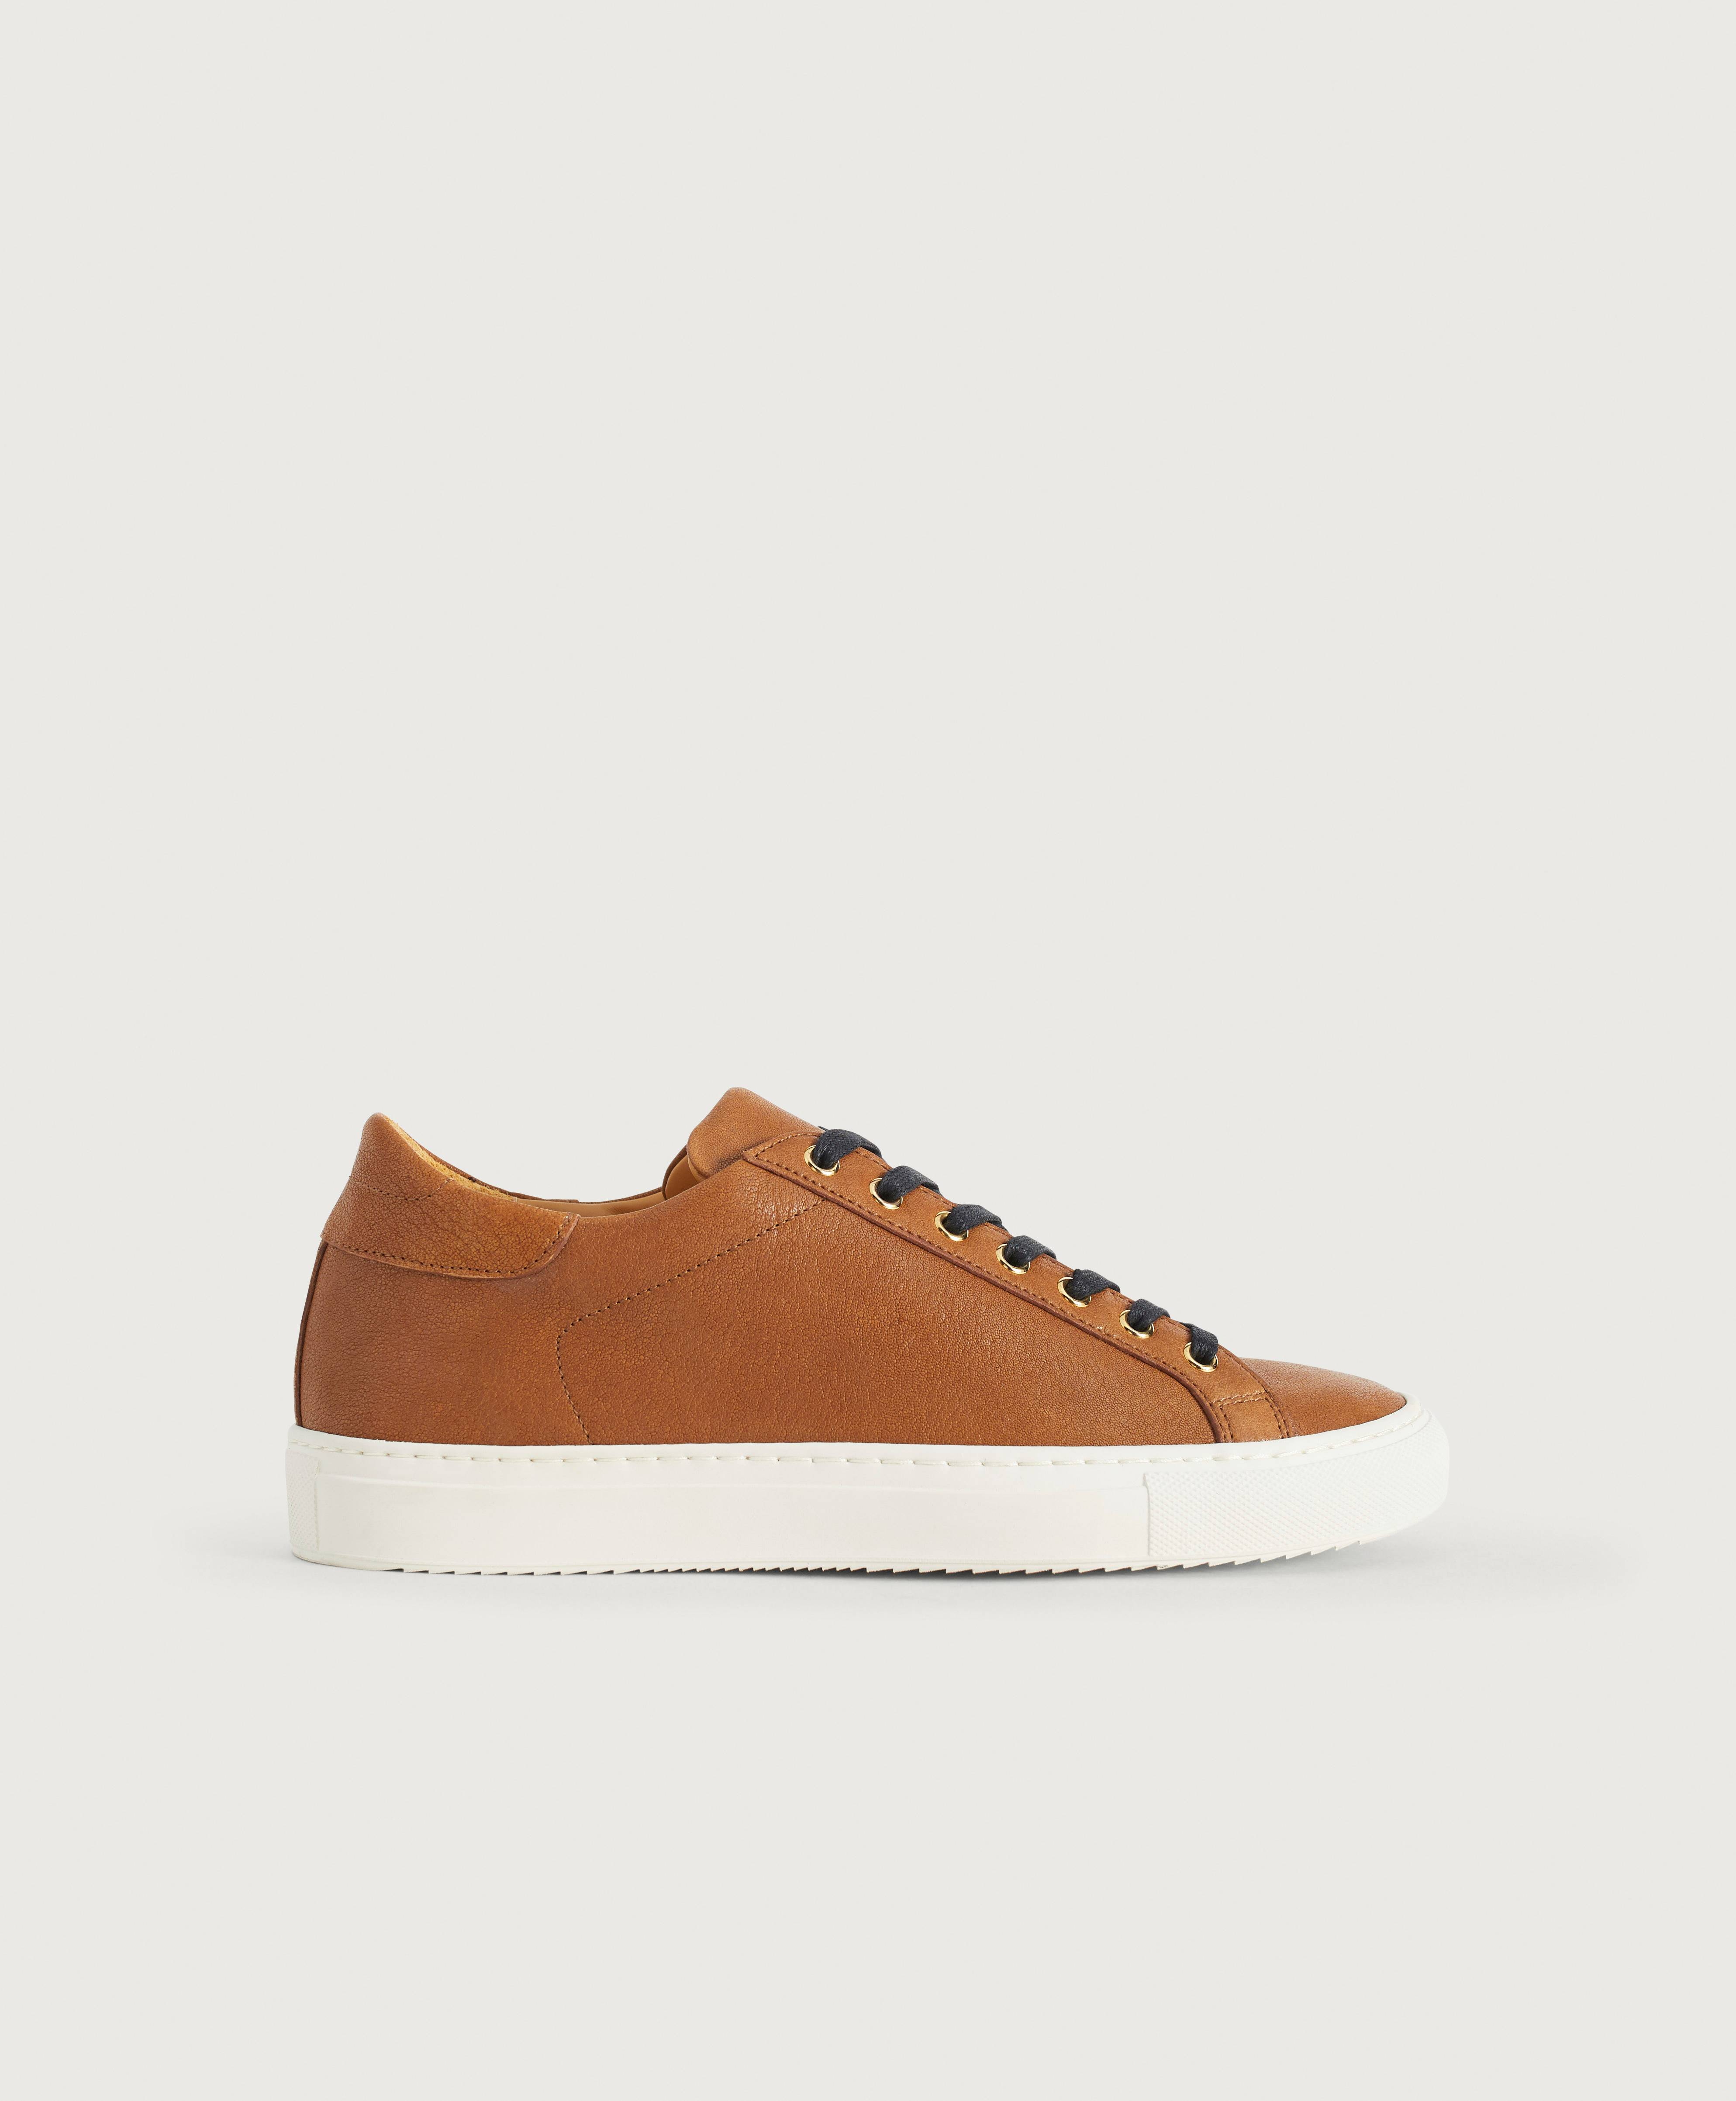 Sandays Wingfield Leather Brun